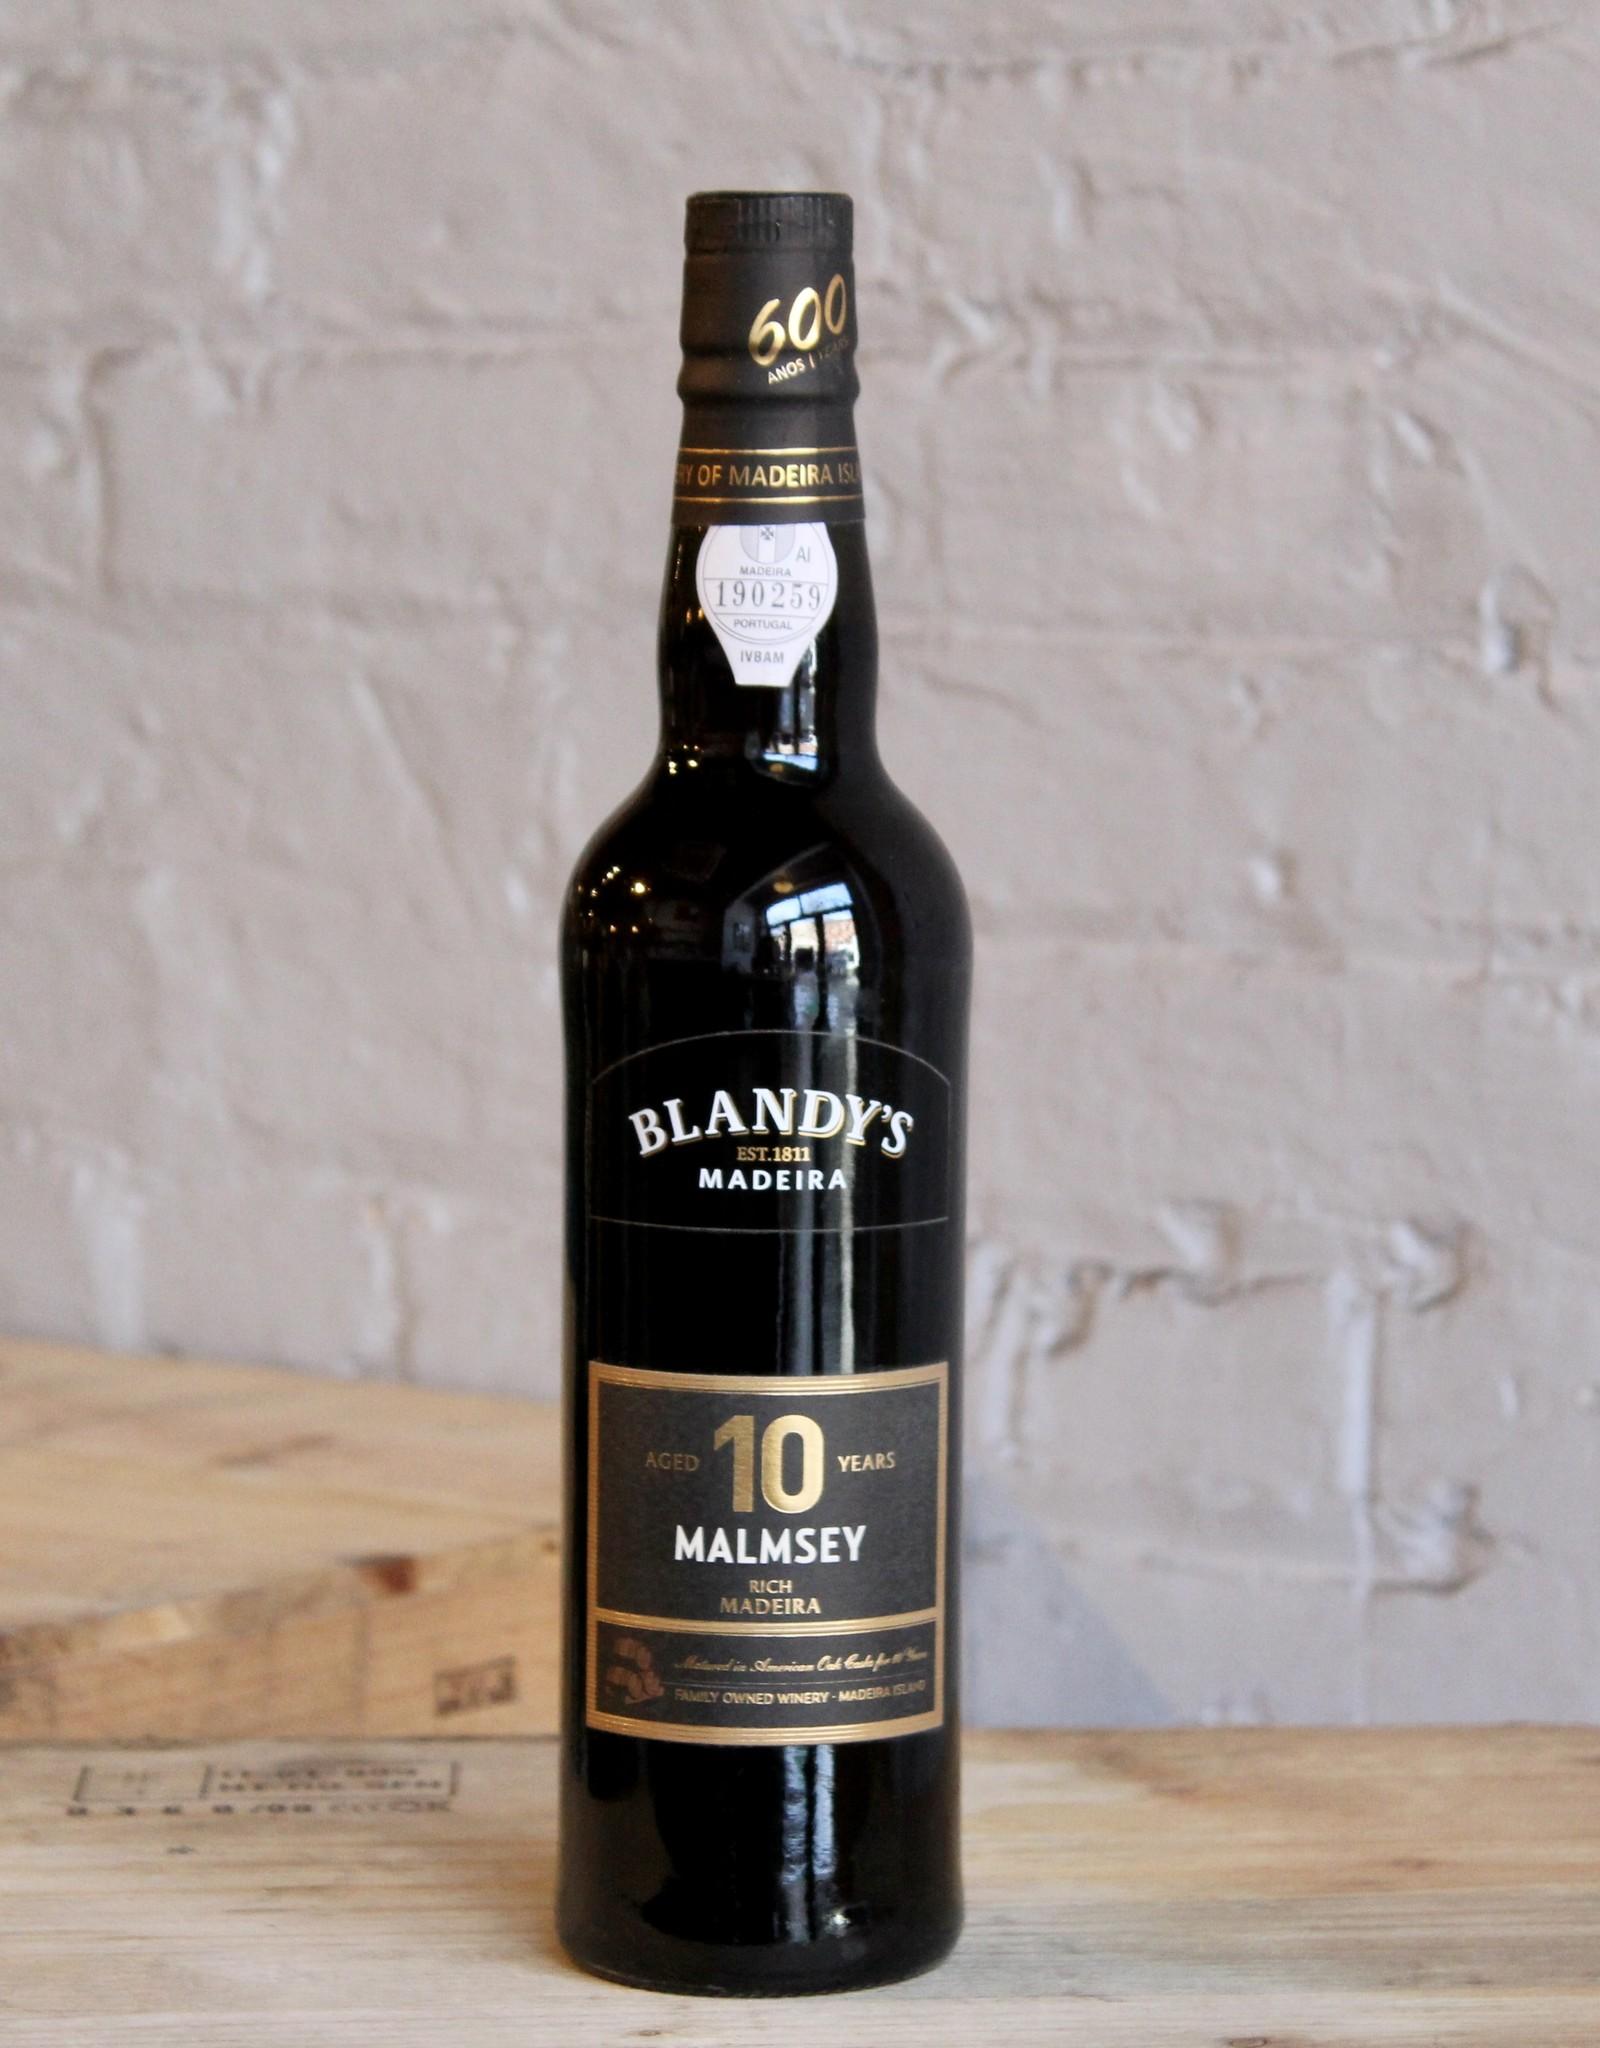 Wine Blandy's 10yr Old Malmsey - Madeira, Portugal (750ml)